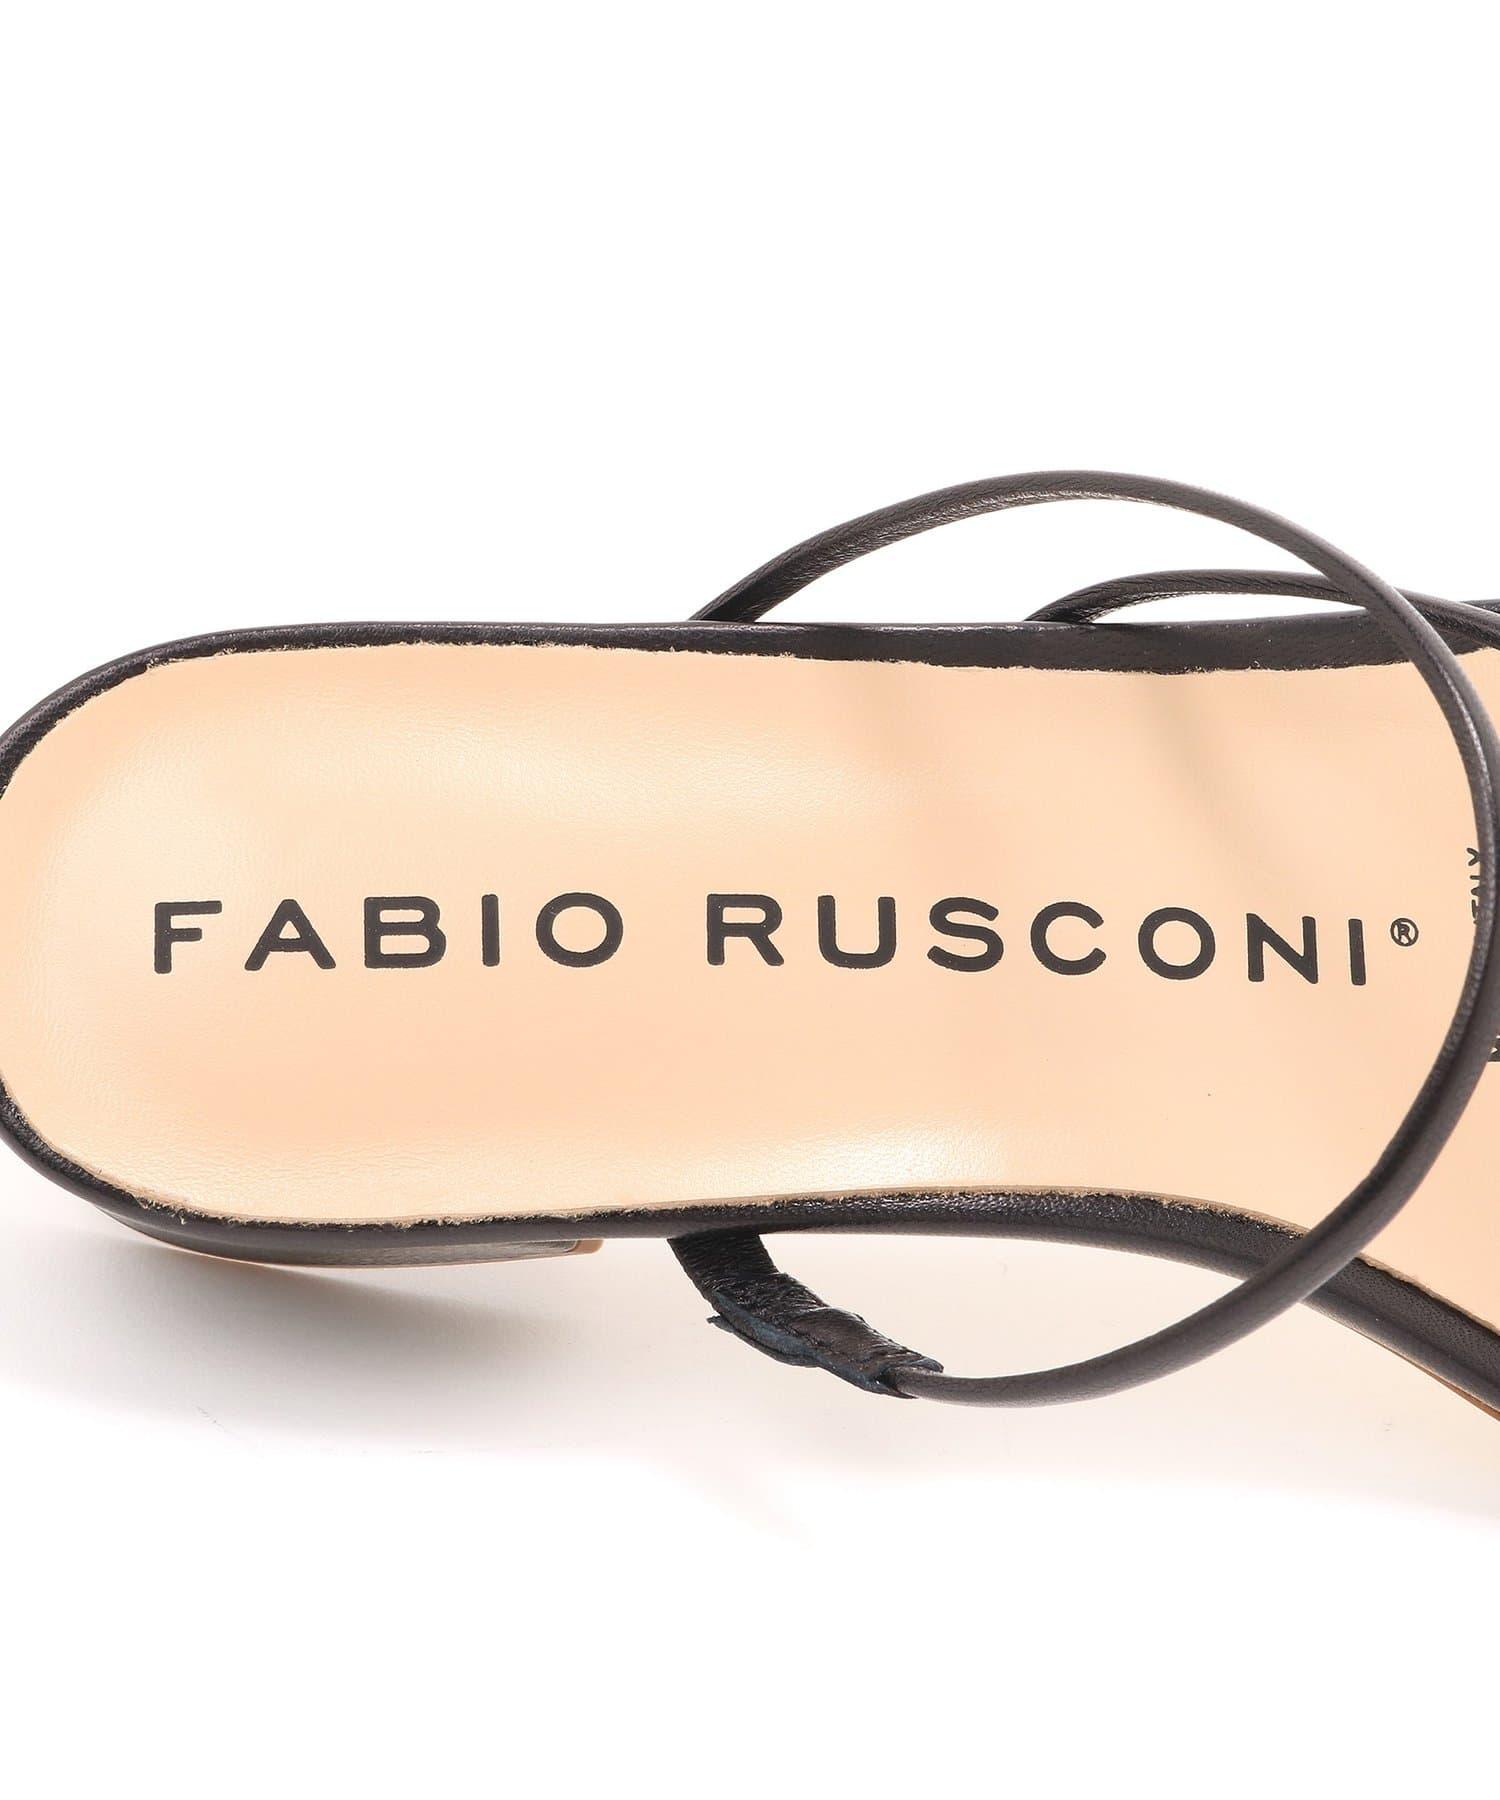 Loungedress(ラウンジドレス) 【FABIO RUSCONI/ファビオ ルスコーニ】華奢ストラップサンダル